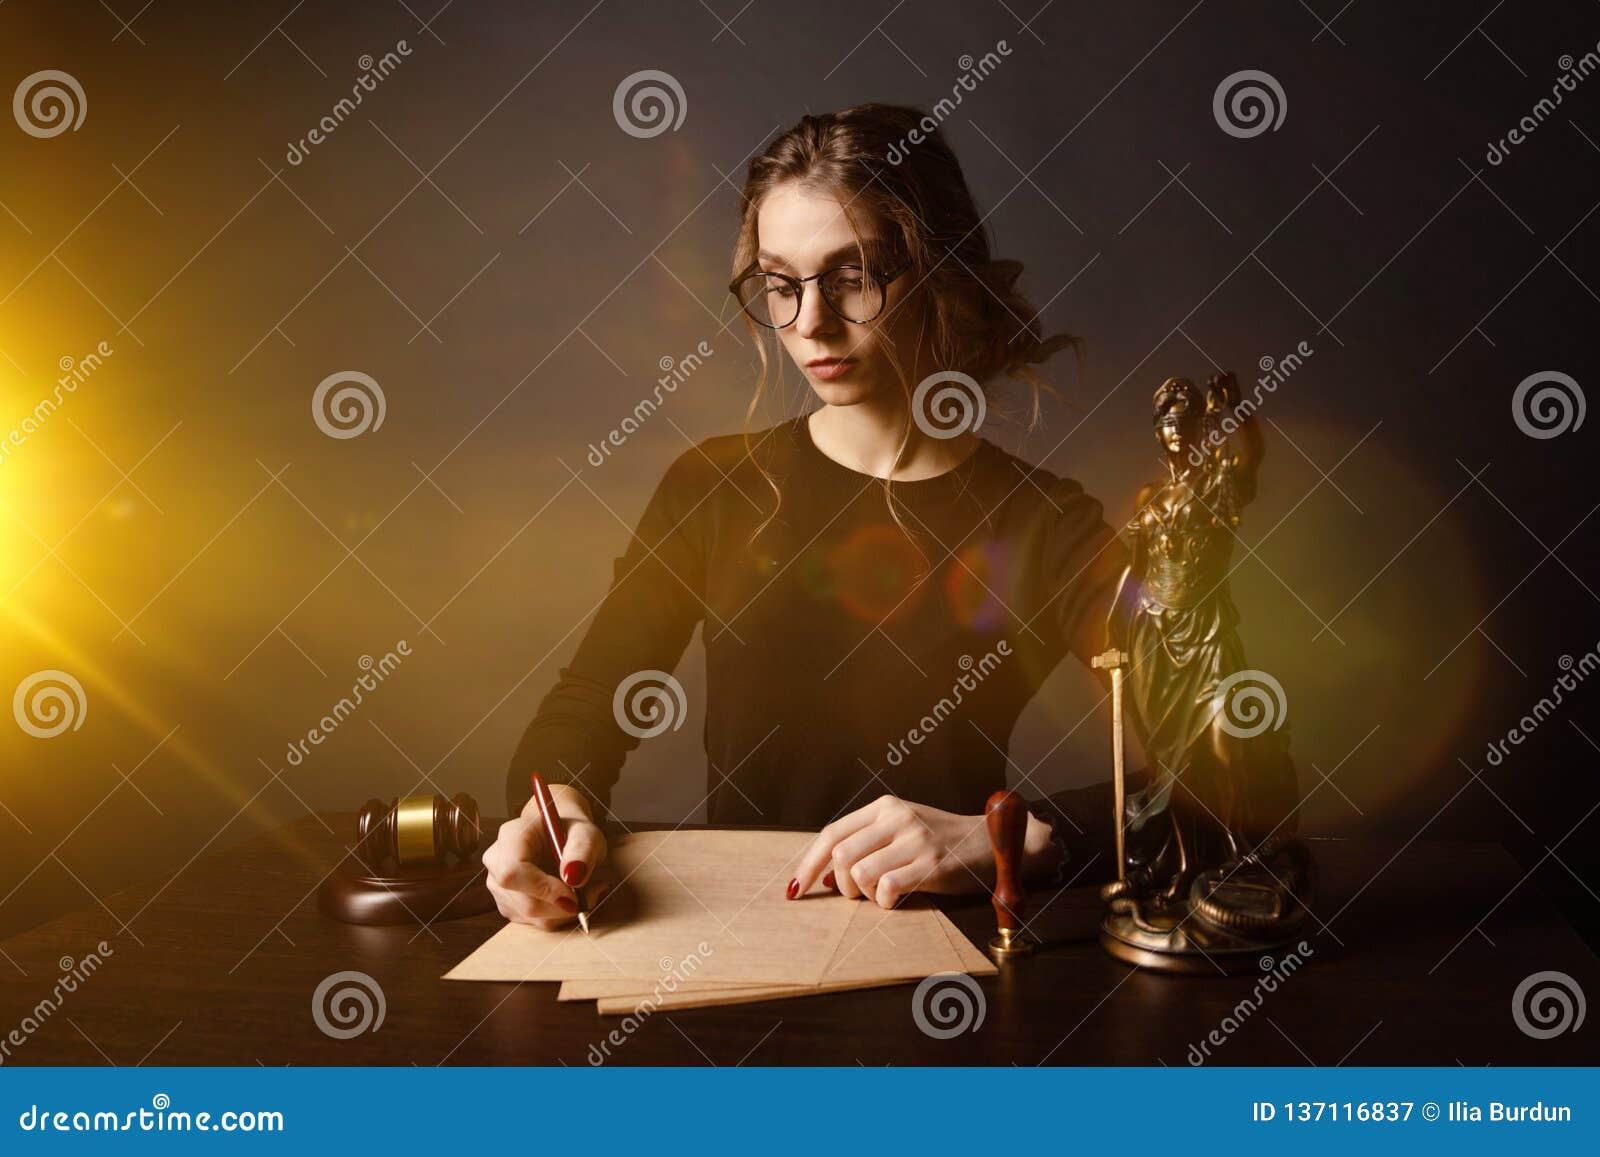 Бизнес-леди юриста работая и знаки нотариуса документы на офисе юрист консультанта, правосудие и закон, юрист